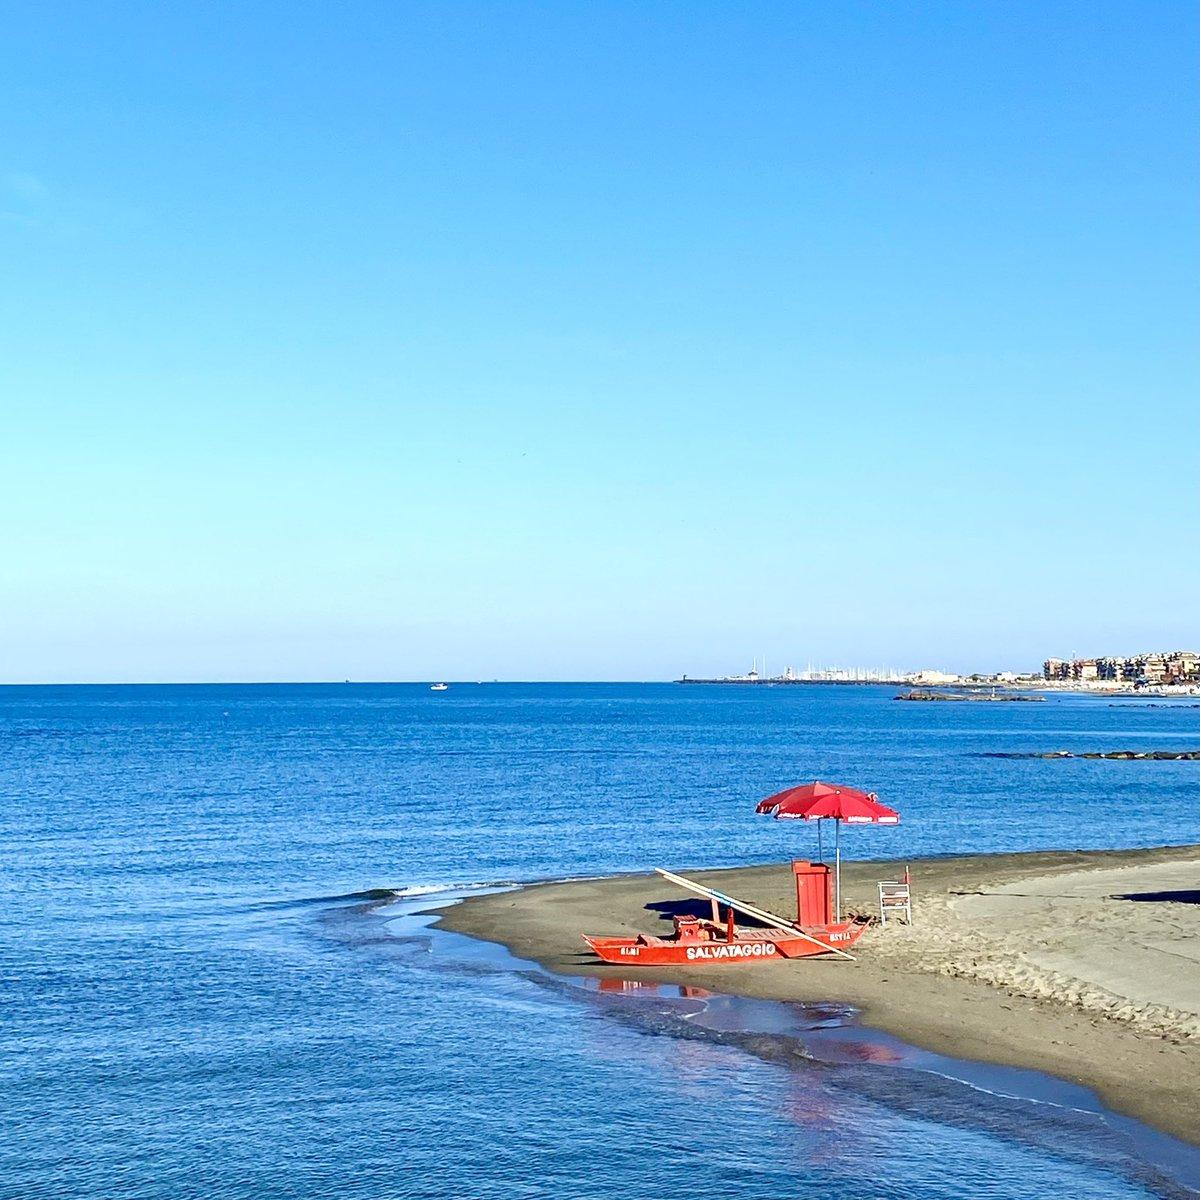 Per esempio il #mare Ostia❤️  • ⛱ • #OstiaLove #OstiaLovers #OstiaLido #OstiaBeach #LidodiOstia #LidodiRoma #Roma #Rome #igersostia #igersroma #instaostia #instaroma #picoftheday #giugno #sea #spiaggia #beach #ostiapop #june #Elmi #pattino #sabato #saturday #ostia♥ #ostia♥️ https://t.co/BRjMTcHoNR